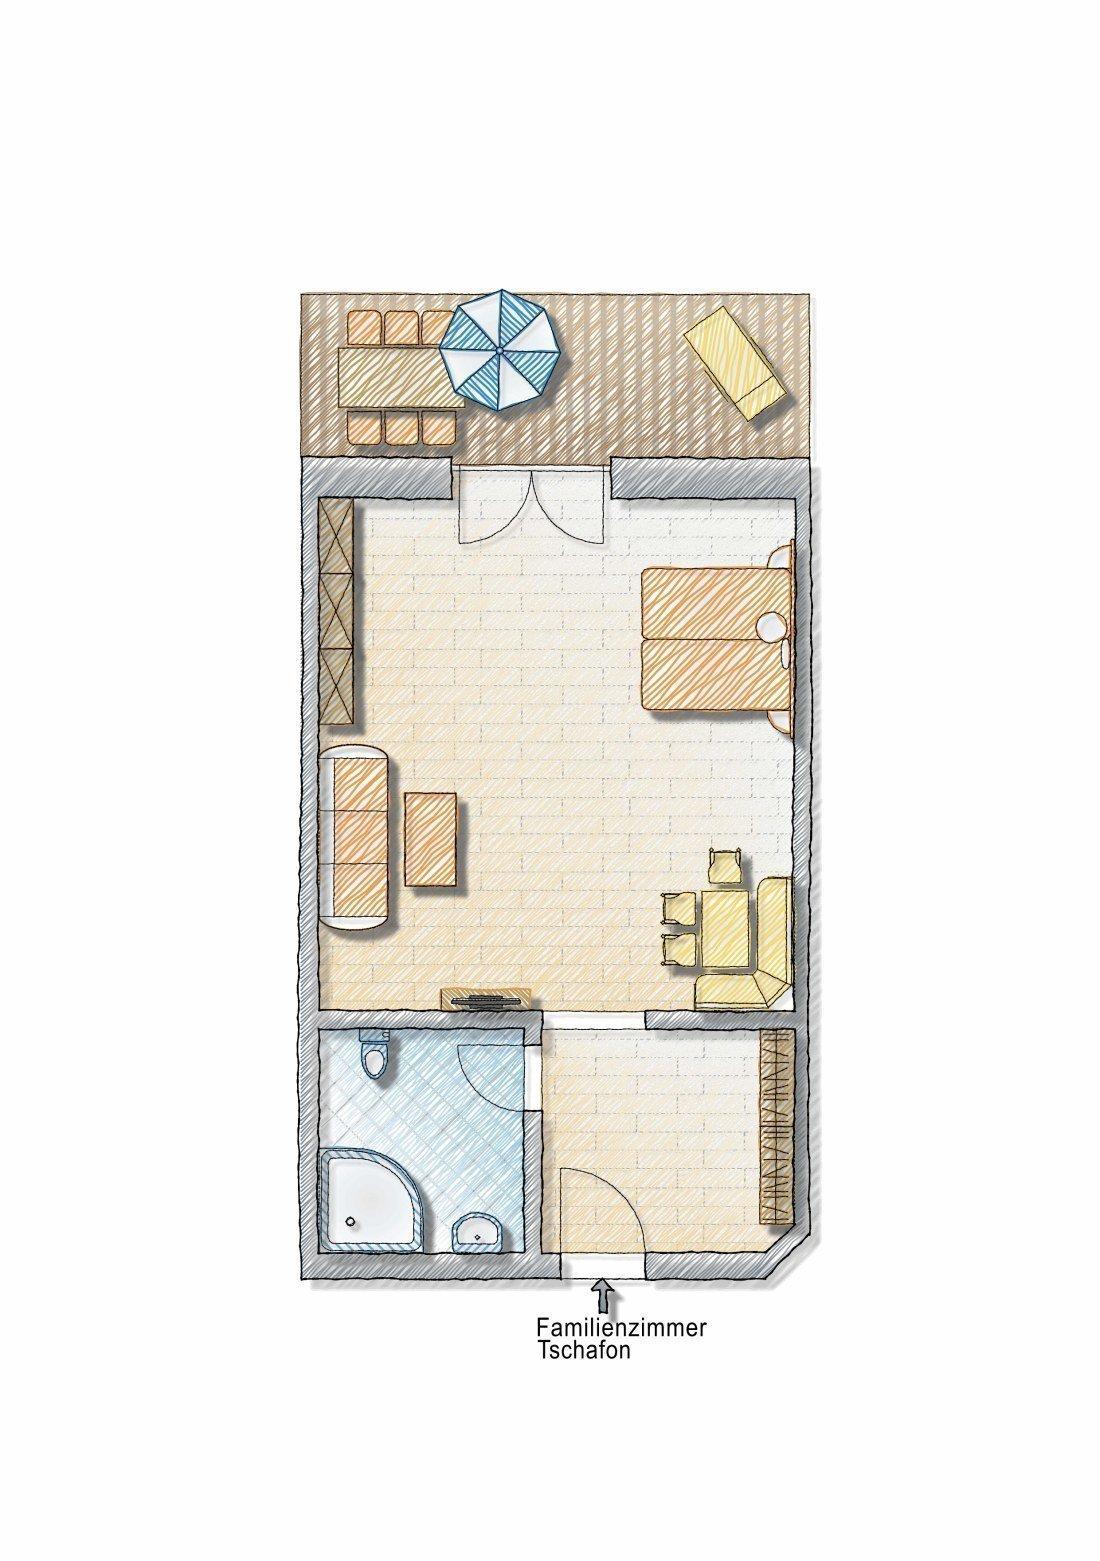 Camera per famiglie Tschafon